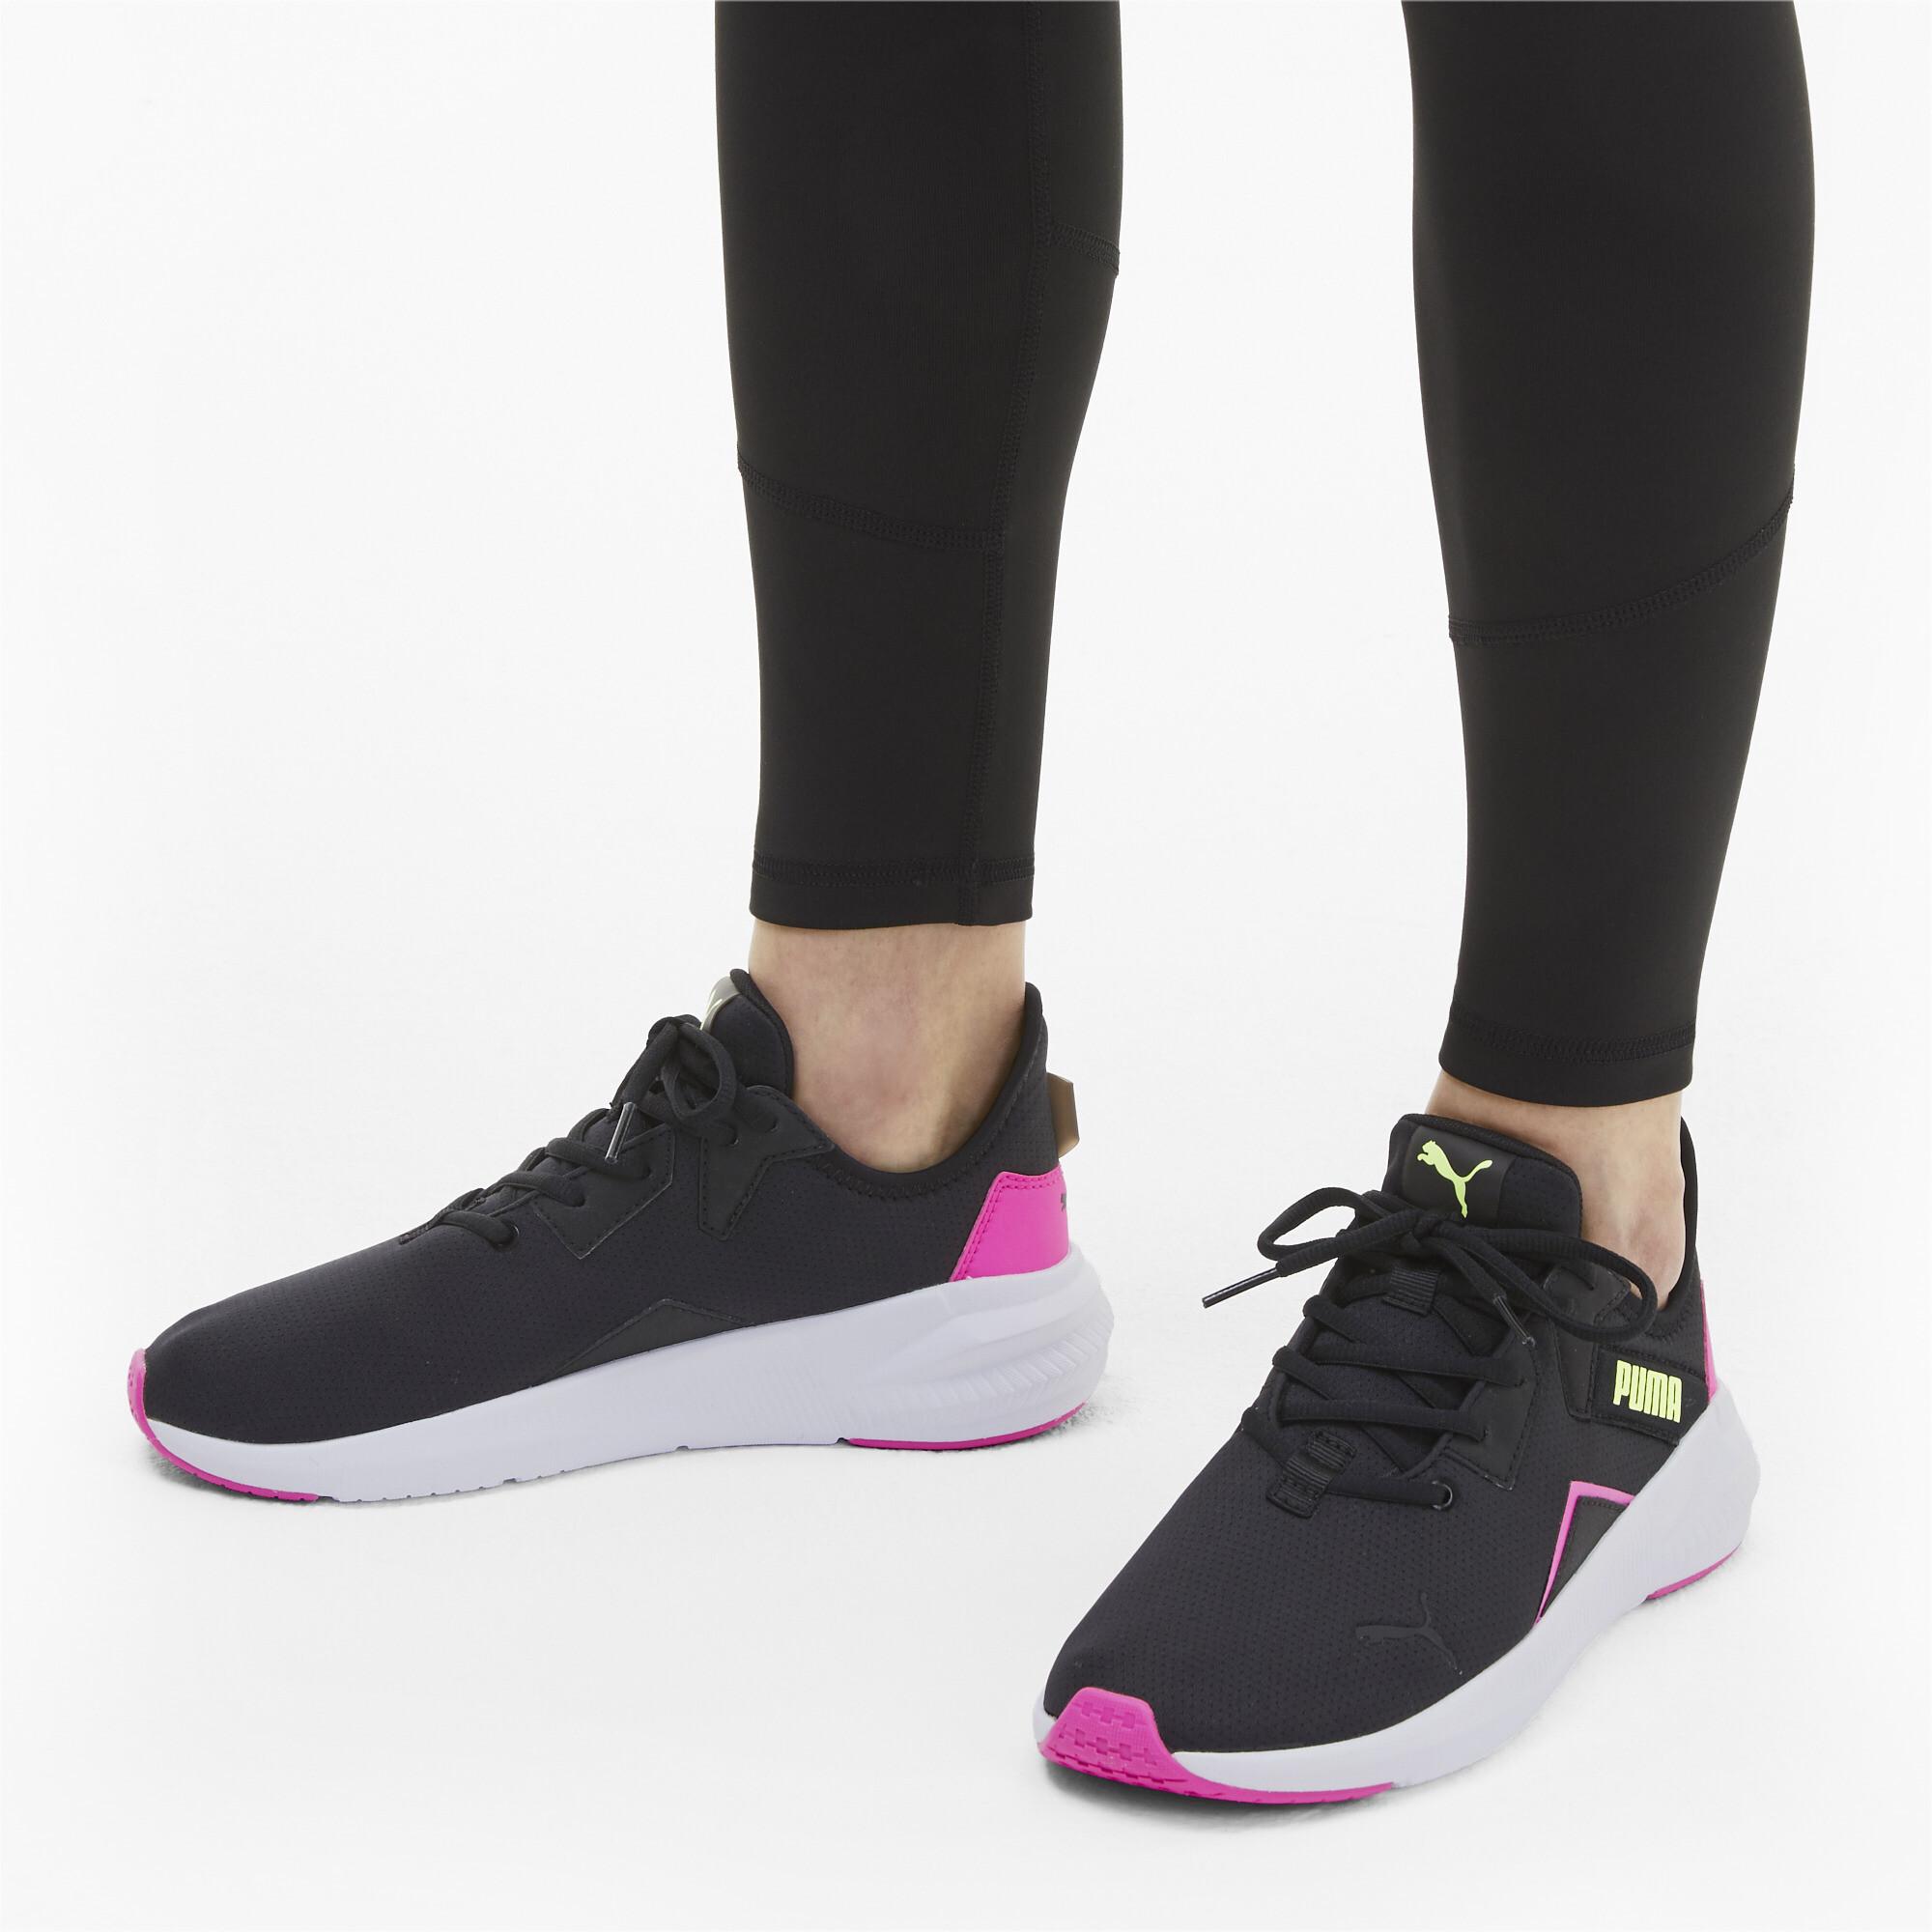 thumbnail 5 - PUMA-Women-039-s-Platinum-Training-Shoes